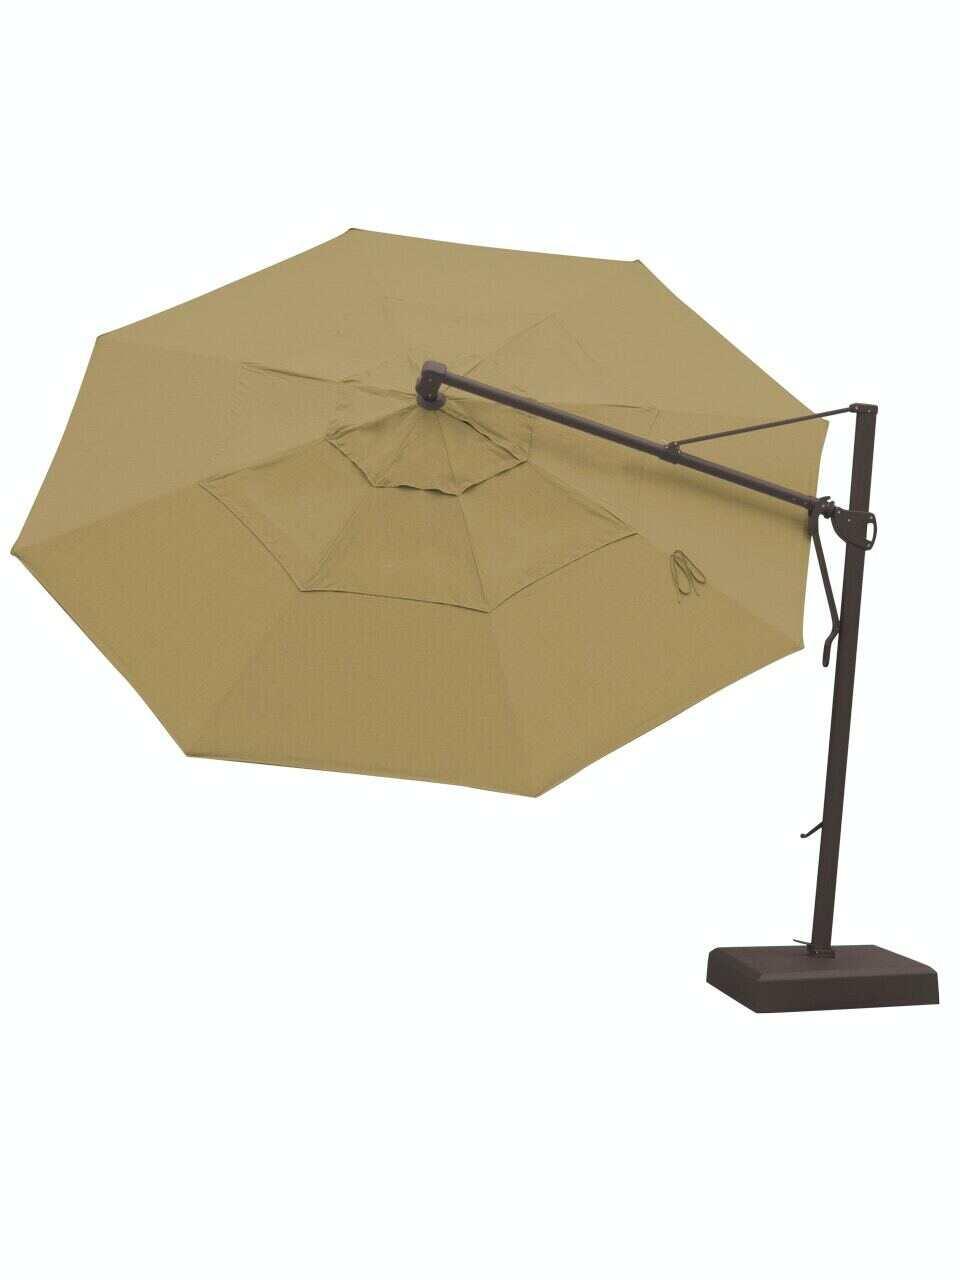 living room treasure garden 13 ft canvas heather beige aluminum cantilever umbrella akz13 7296138